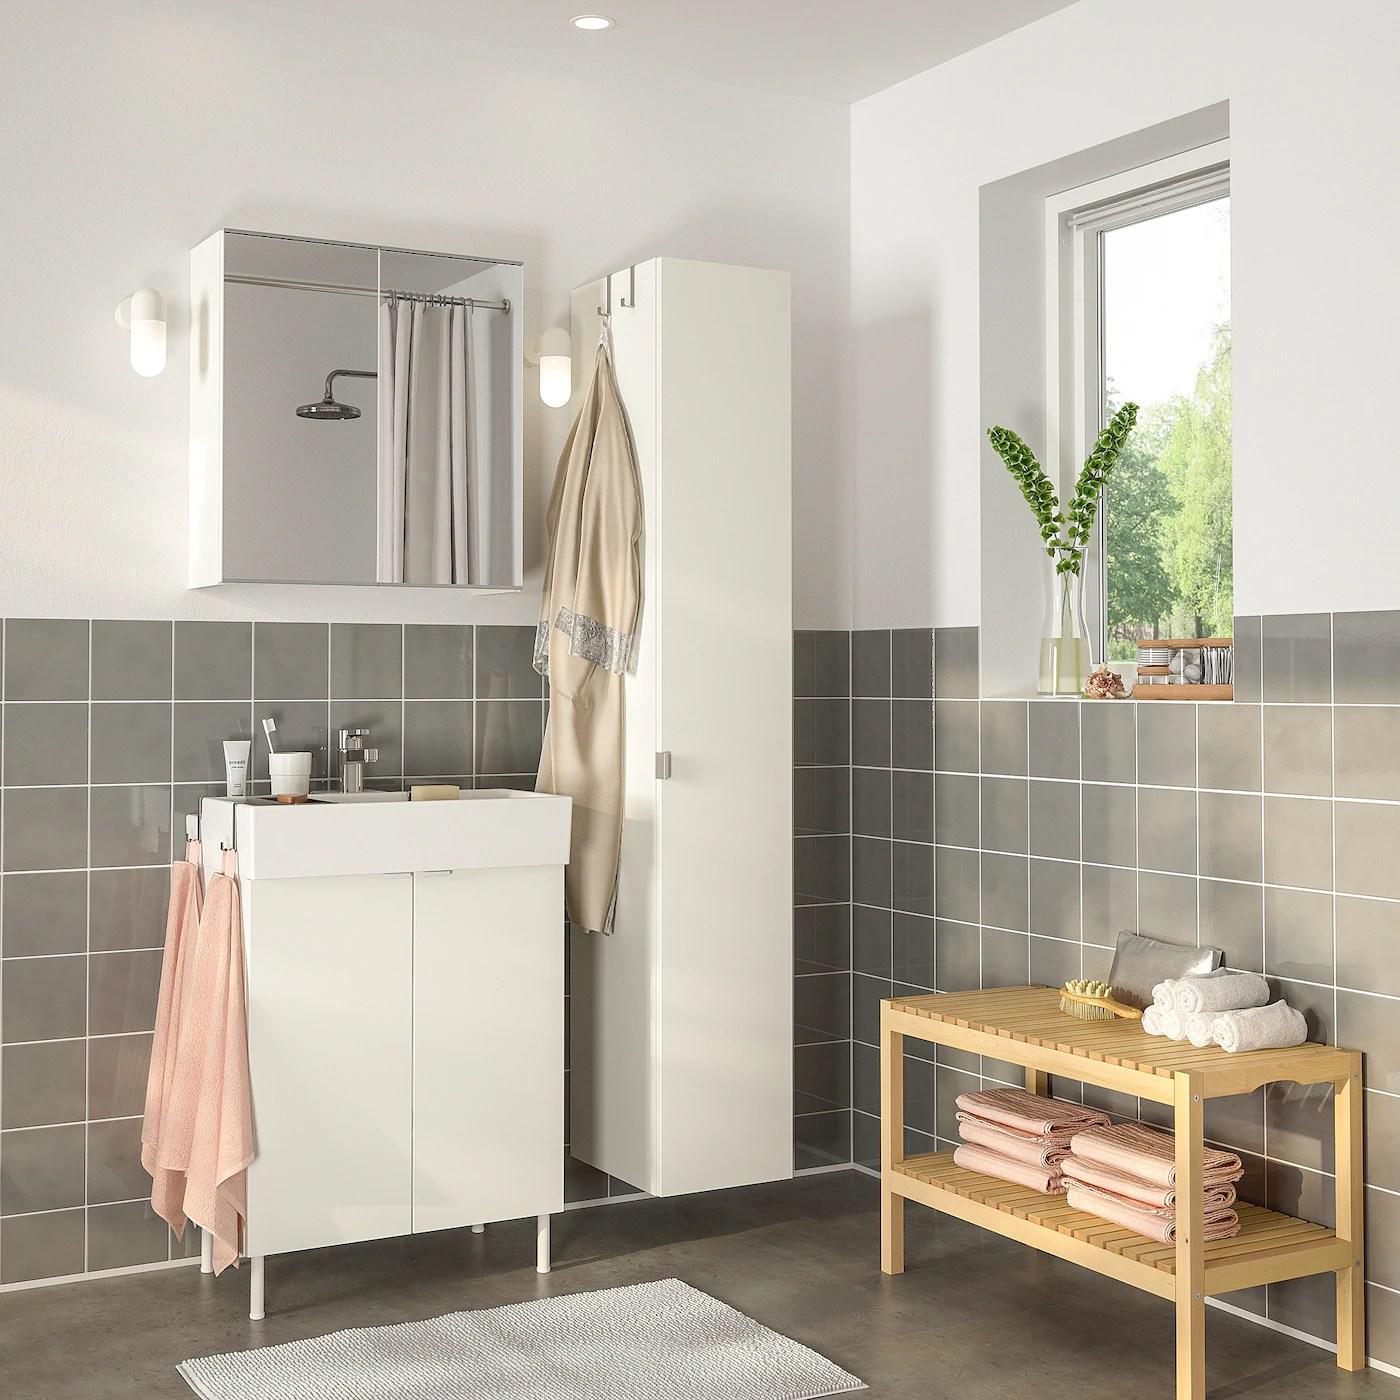 Lillangen Lillangen Bathroom Furniture Set Of 6 White Ensen Tap Ikea